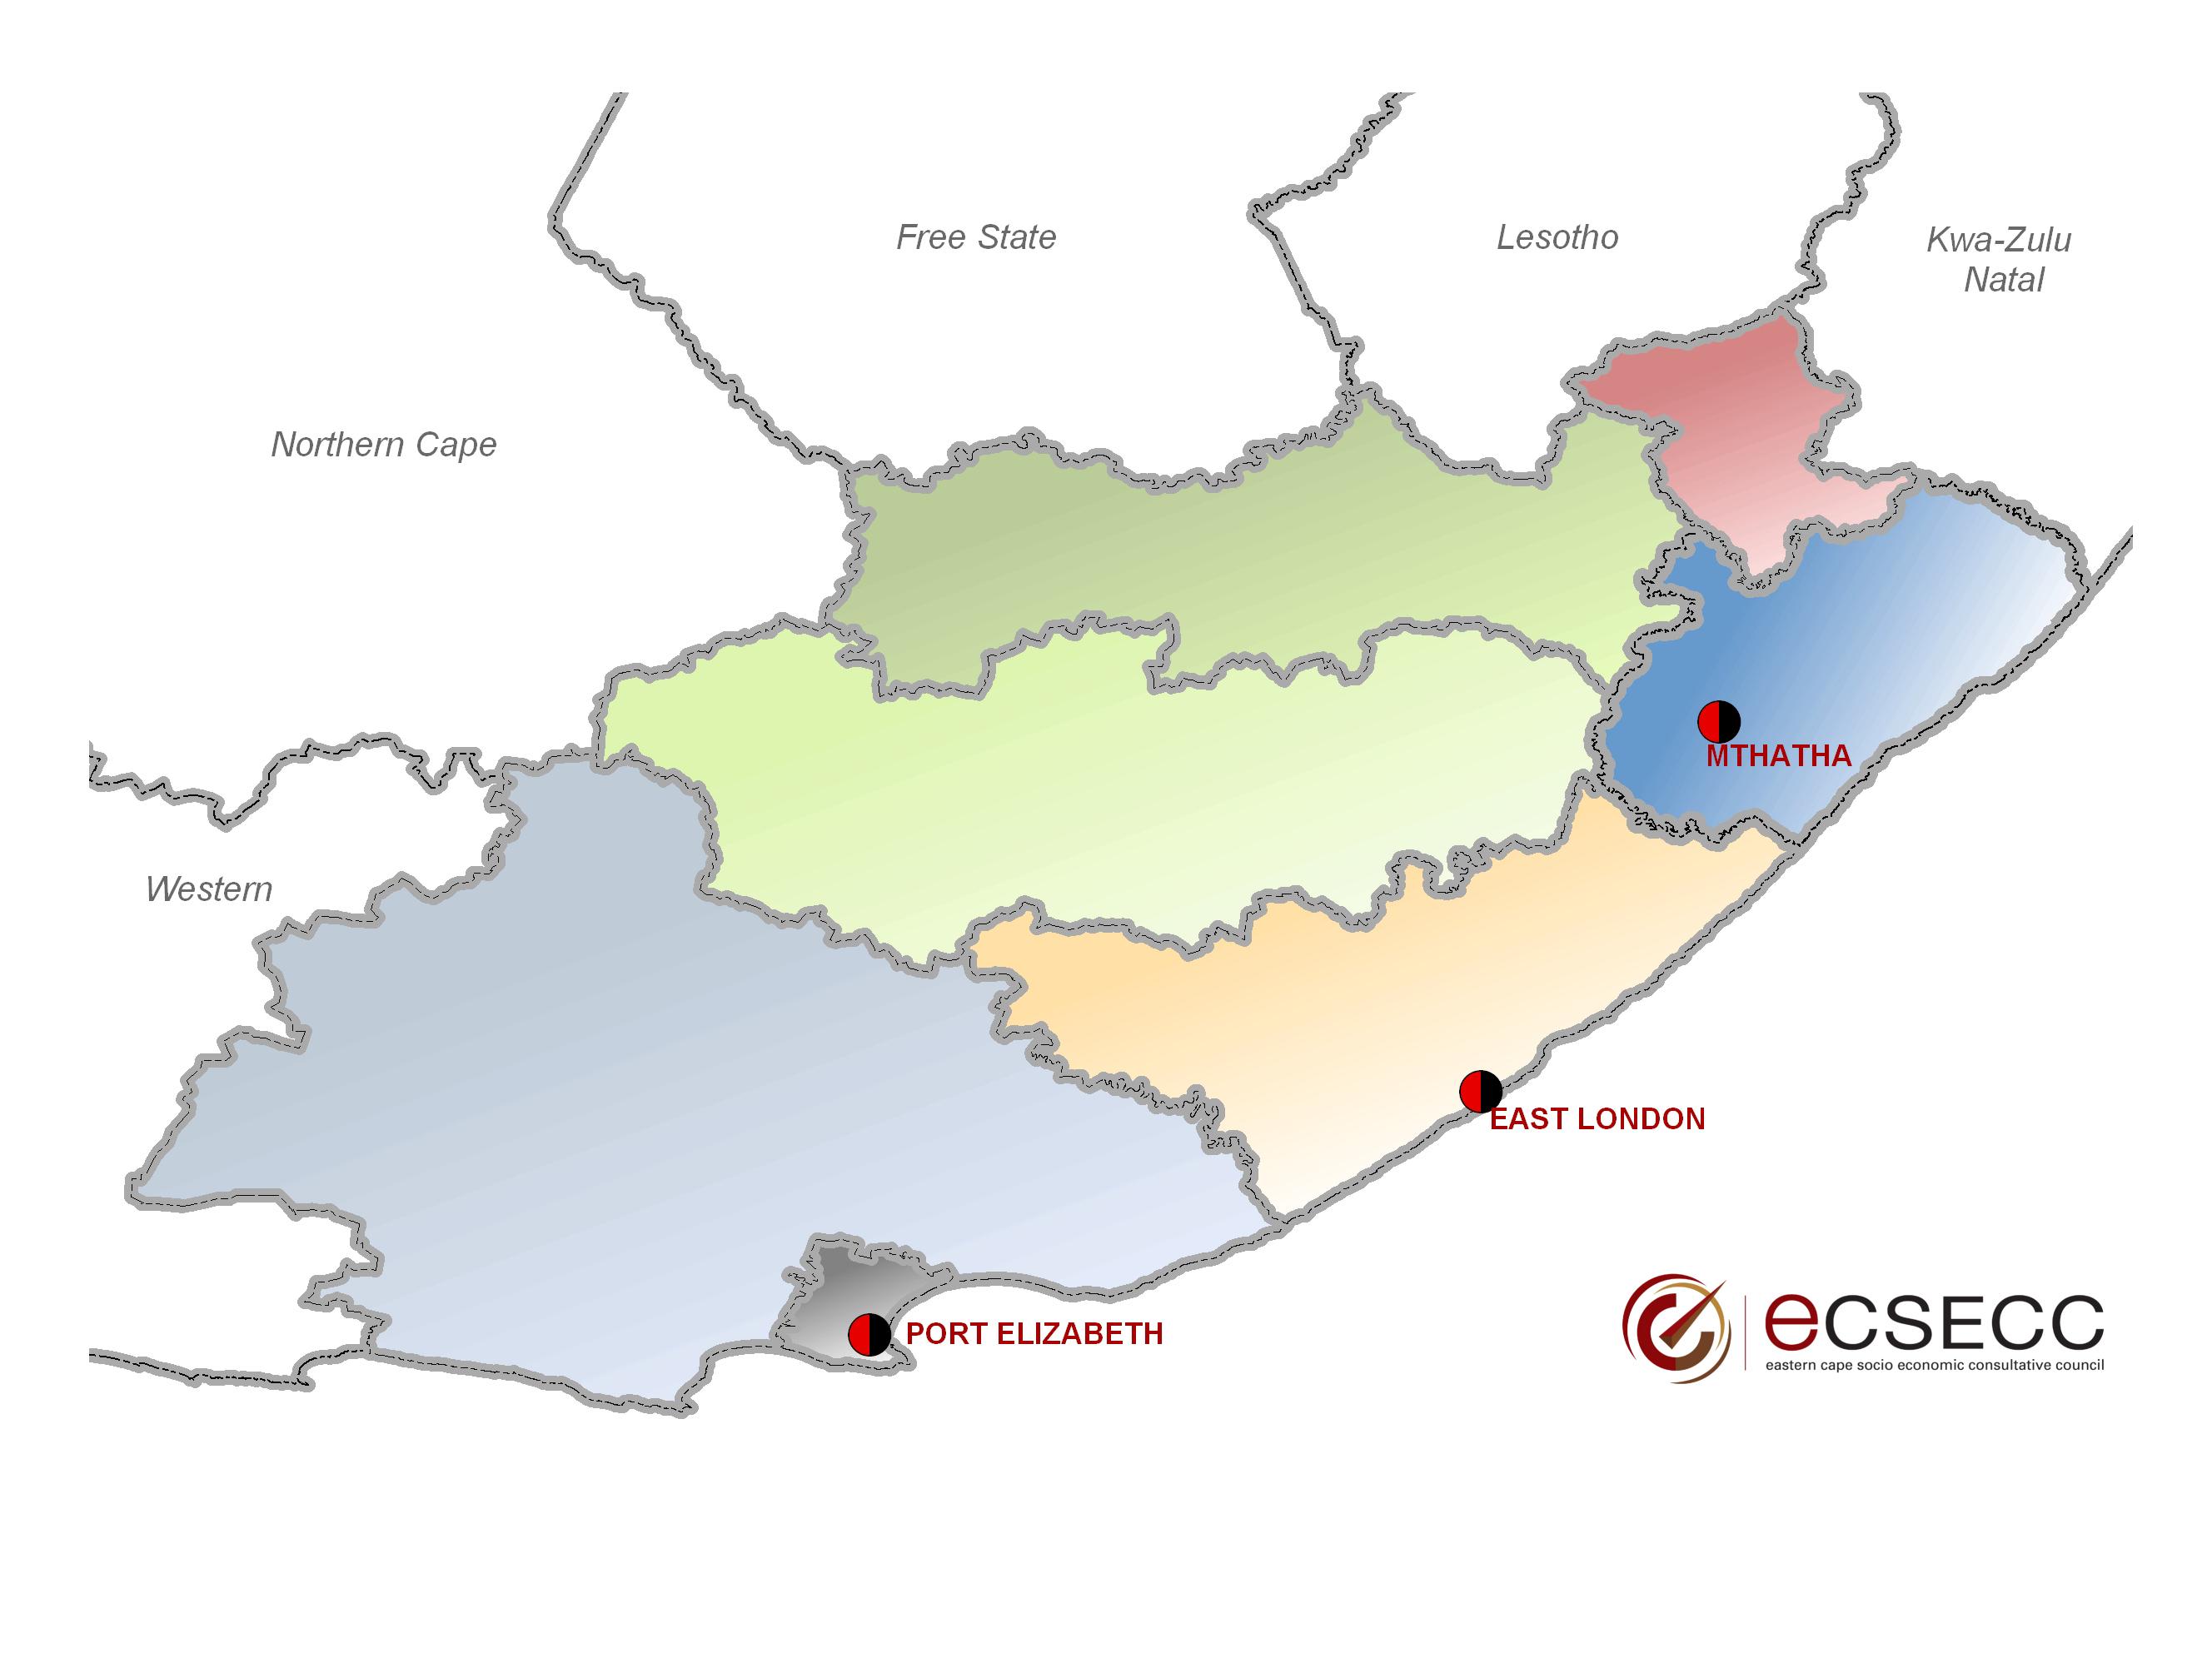 Basic Map Of London.Eastern Cape District Municipalities Basic Map Ecsecc